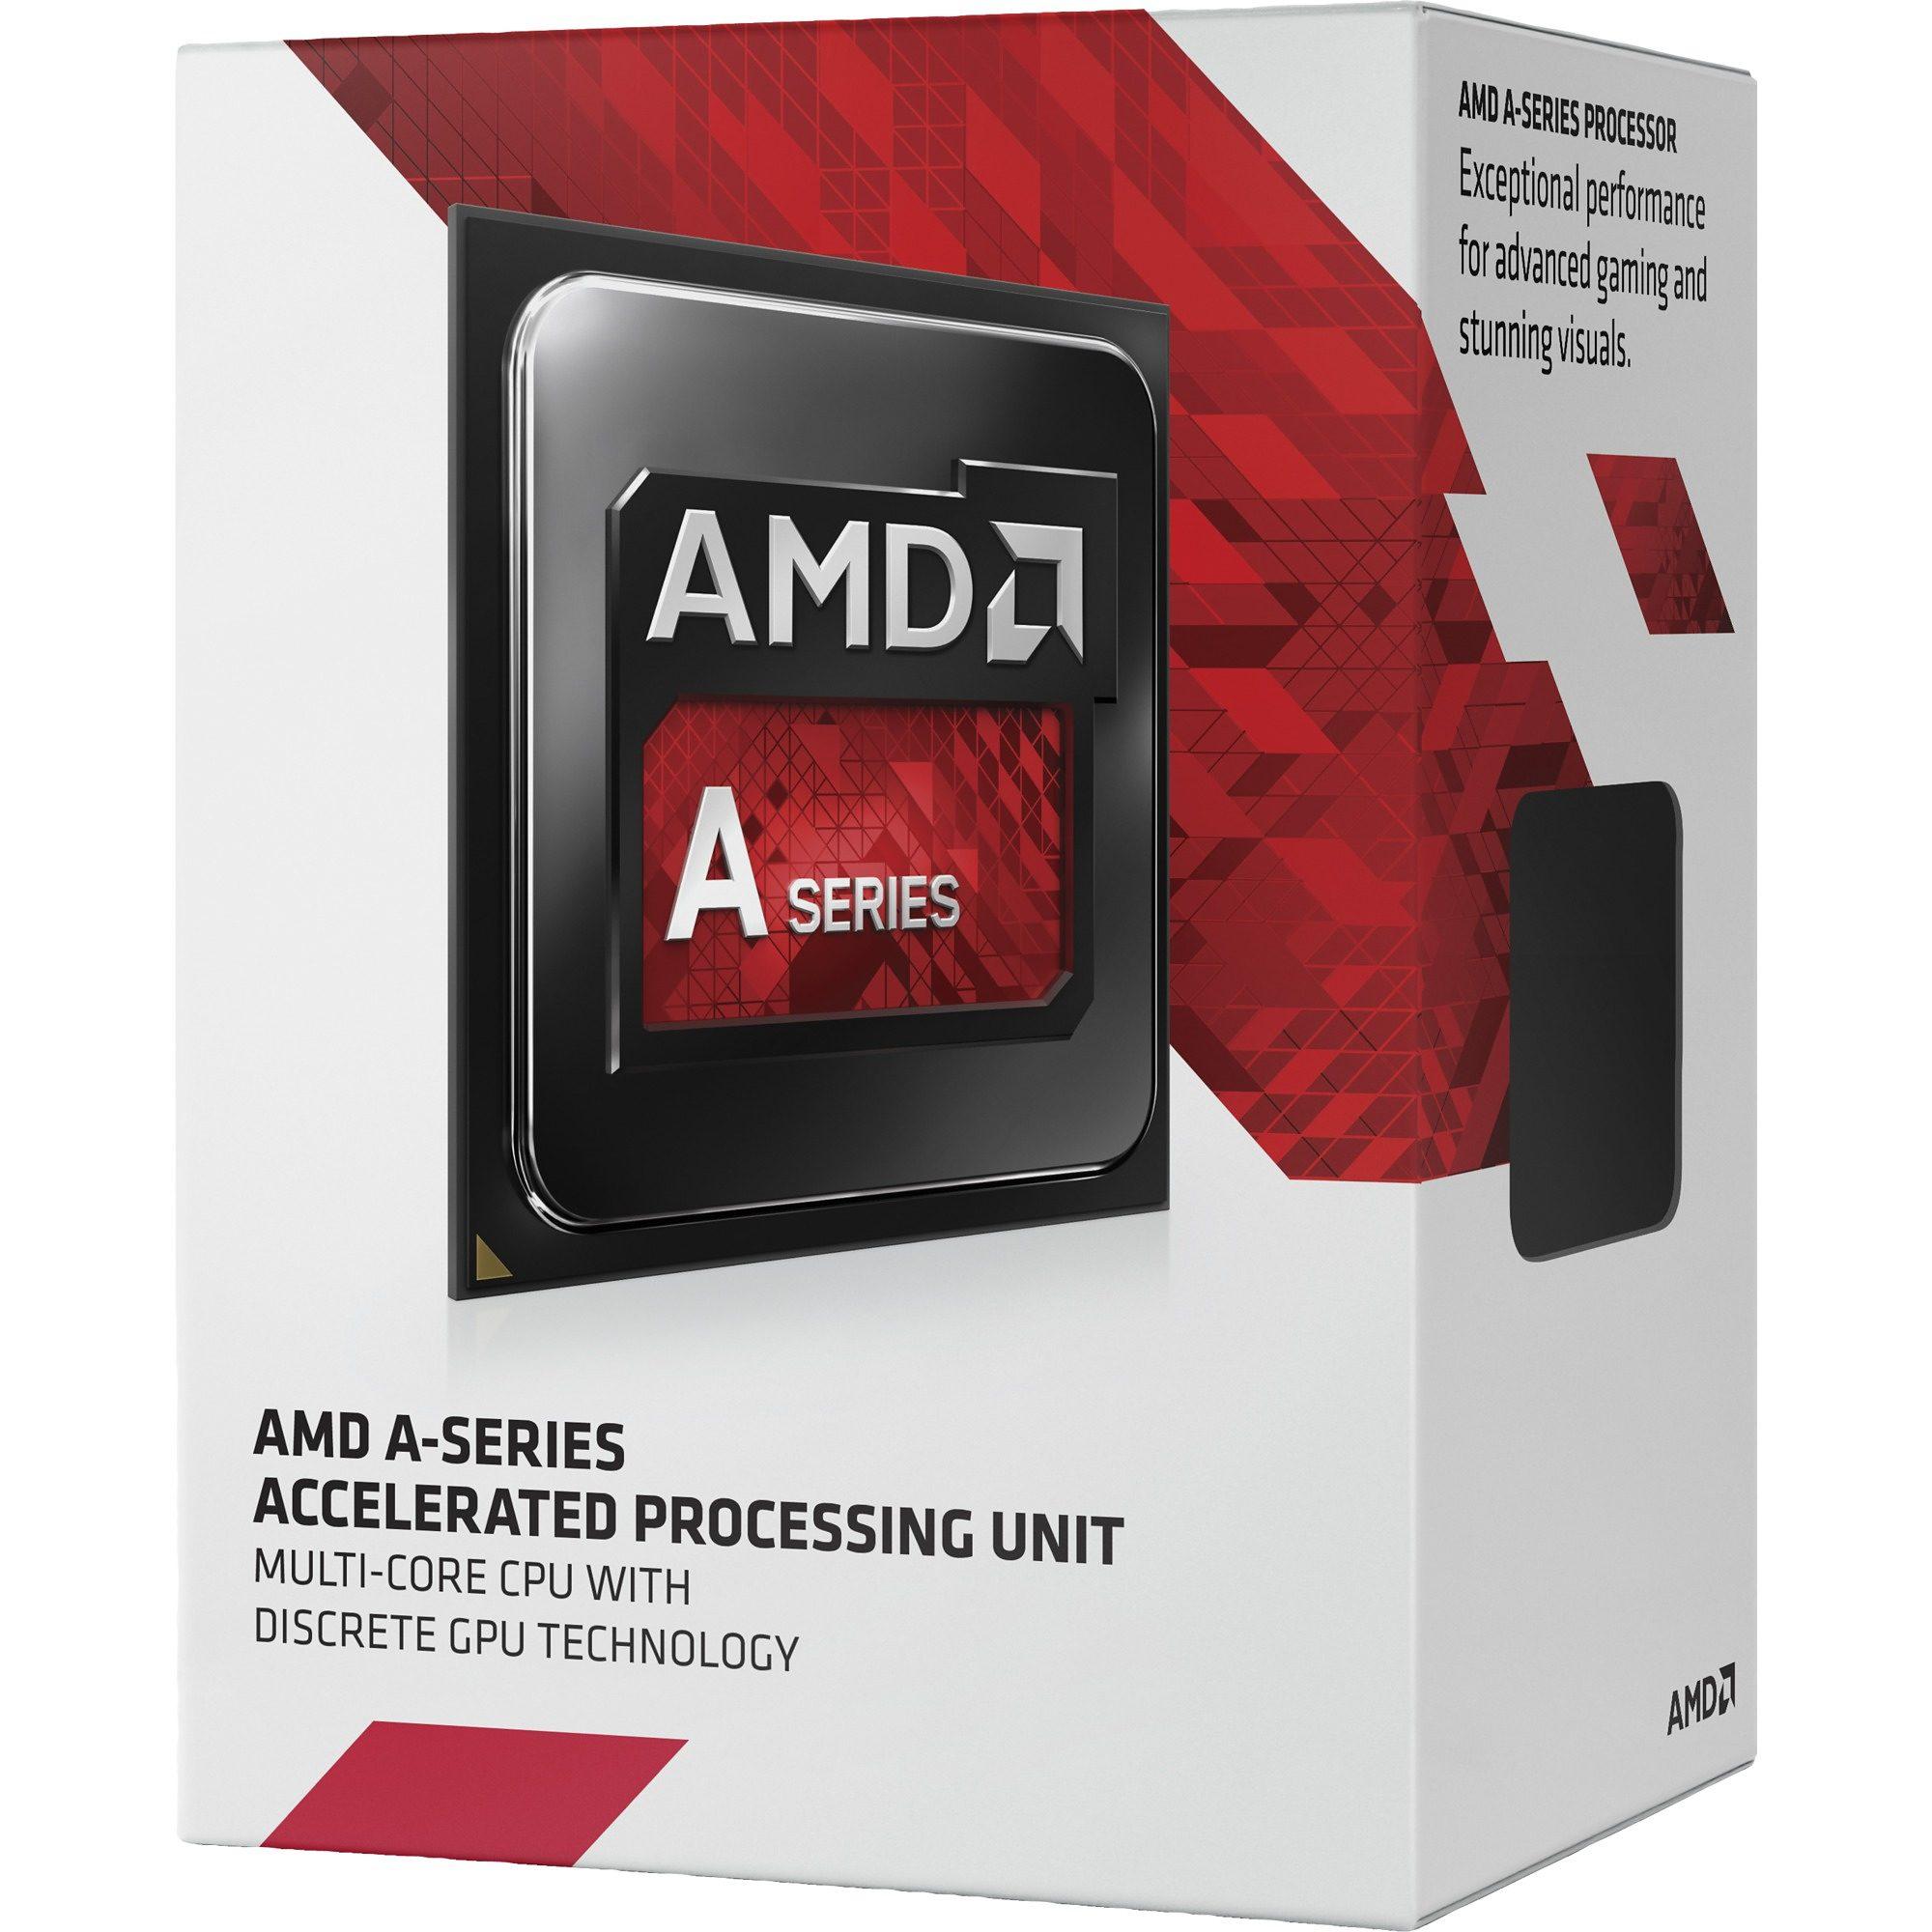 AMD Prozessor »A10-7700K Accelerated Processor«